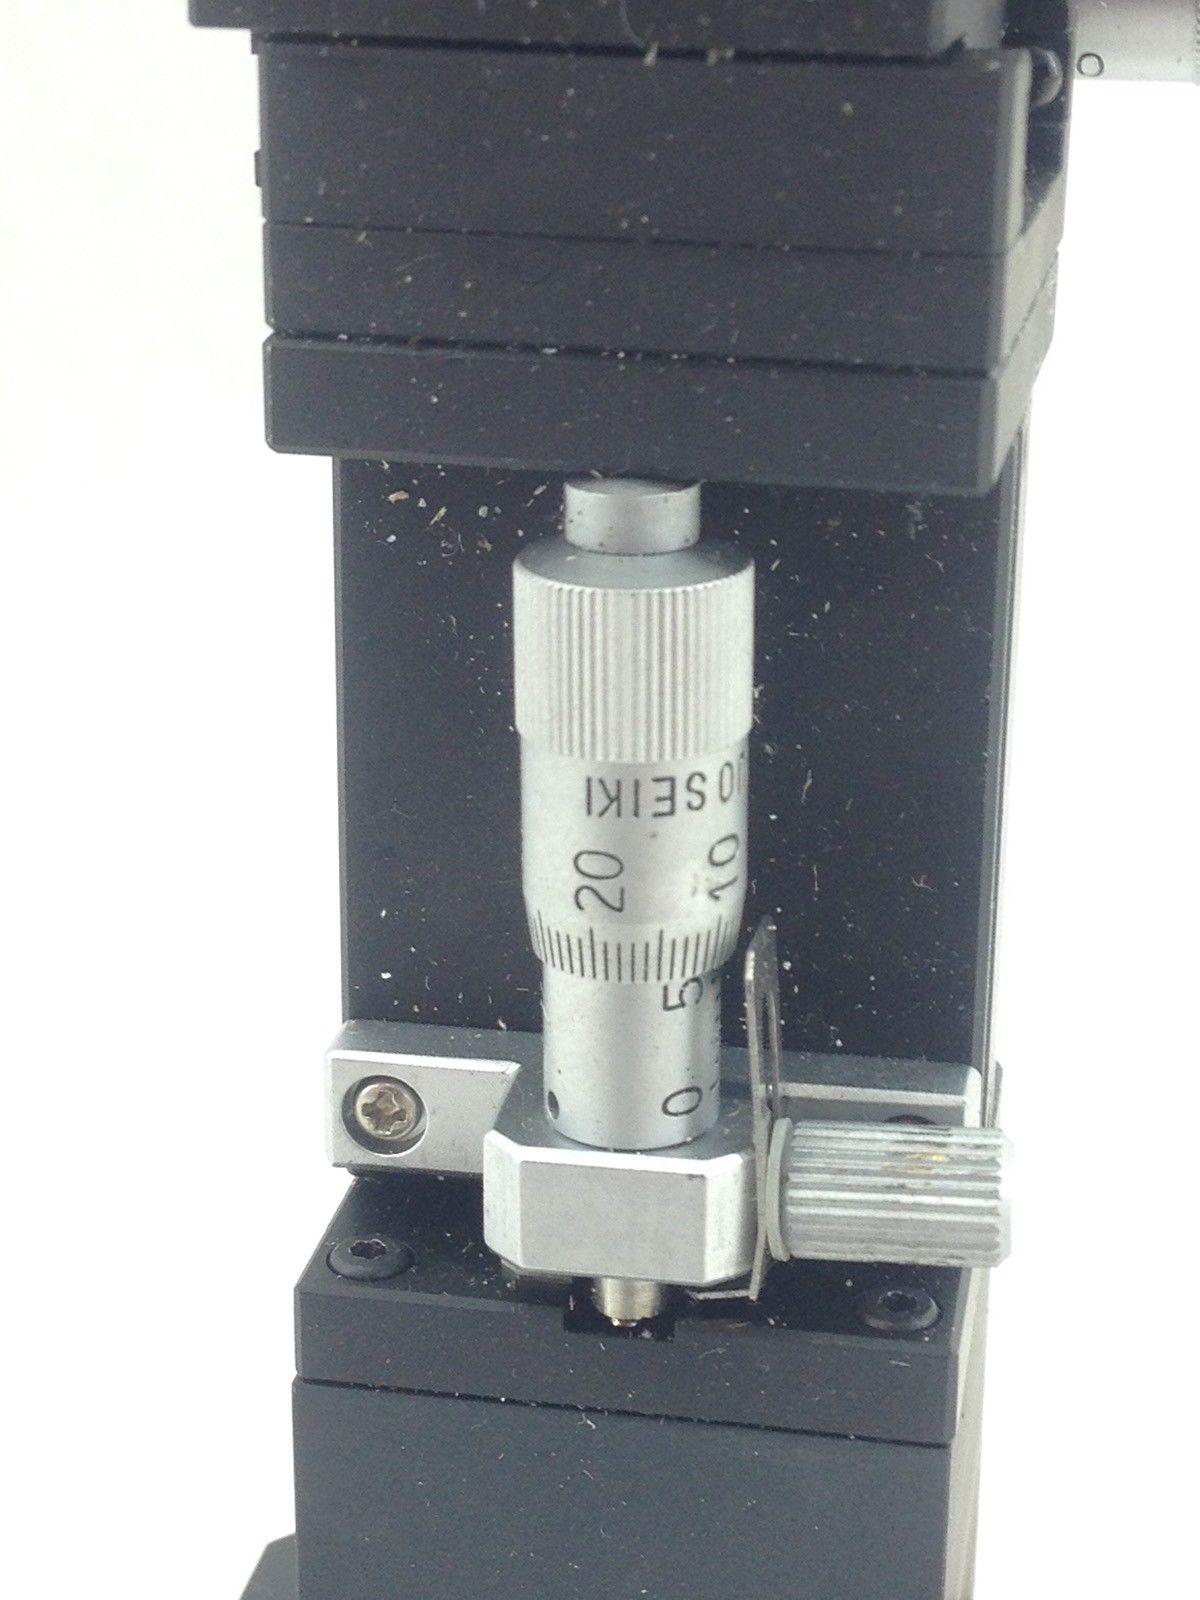 OPTOMECHANICAL ASSY W/ 021128 MICRO-CONTROLLER BOARD (H330) 4